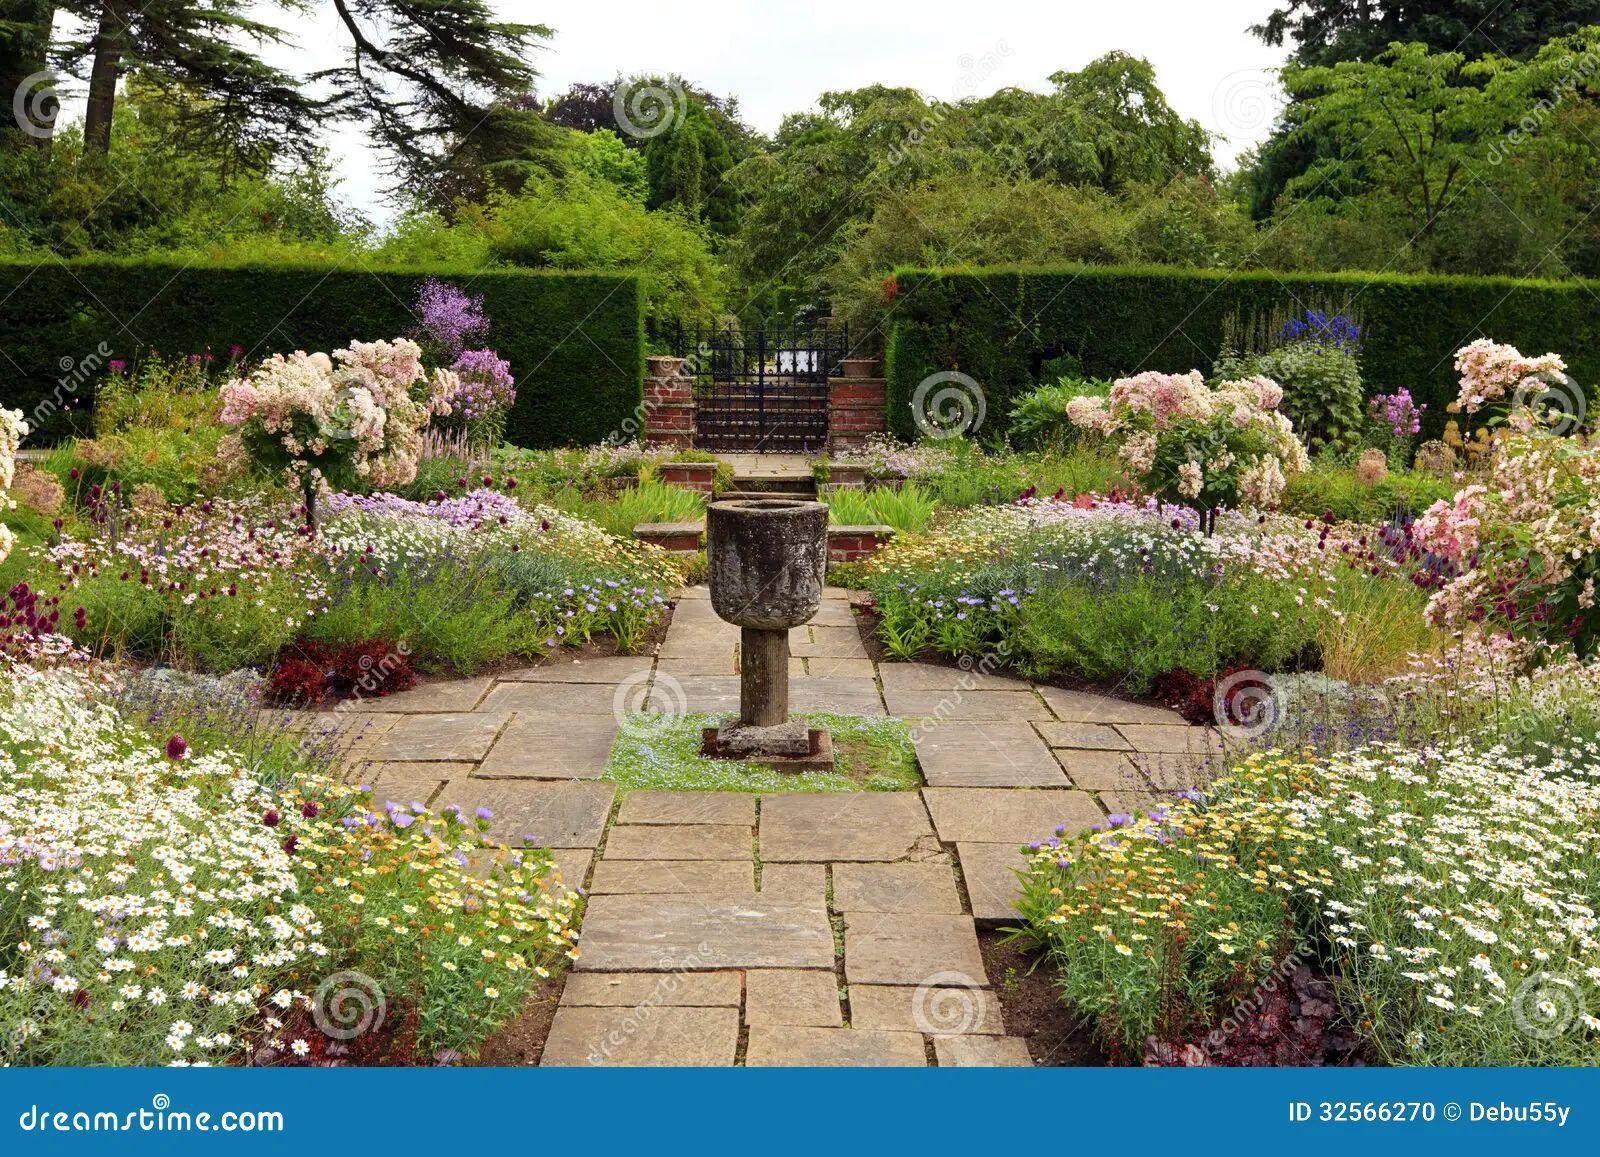 English formal garden stock photo image 32566270